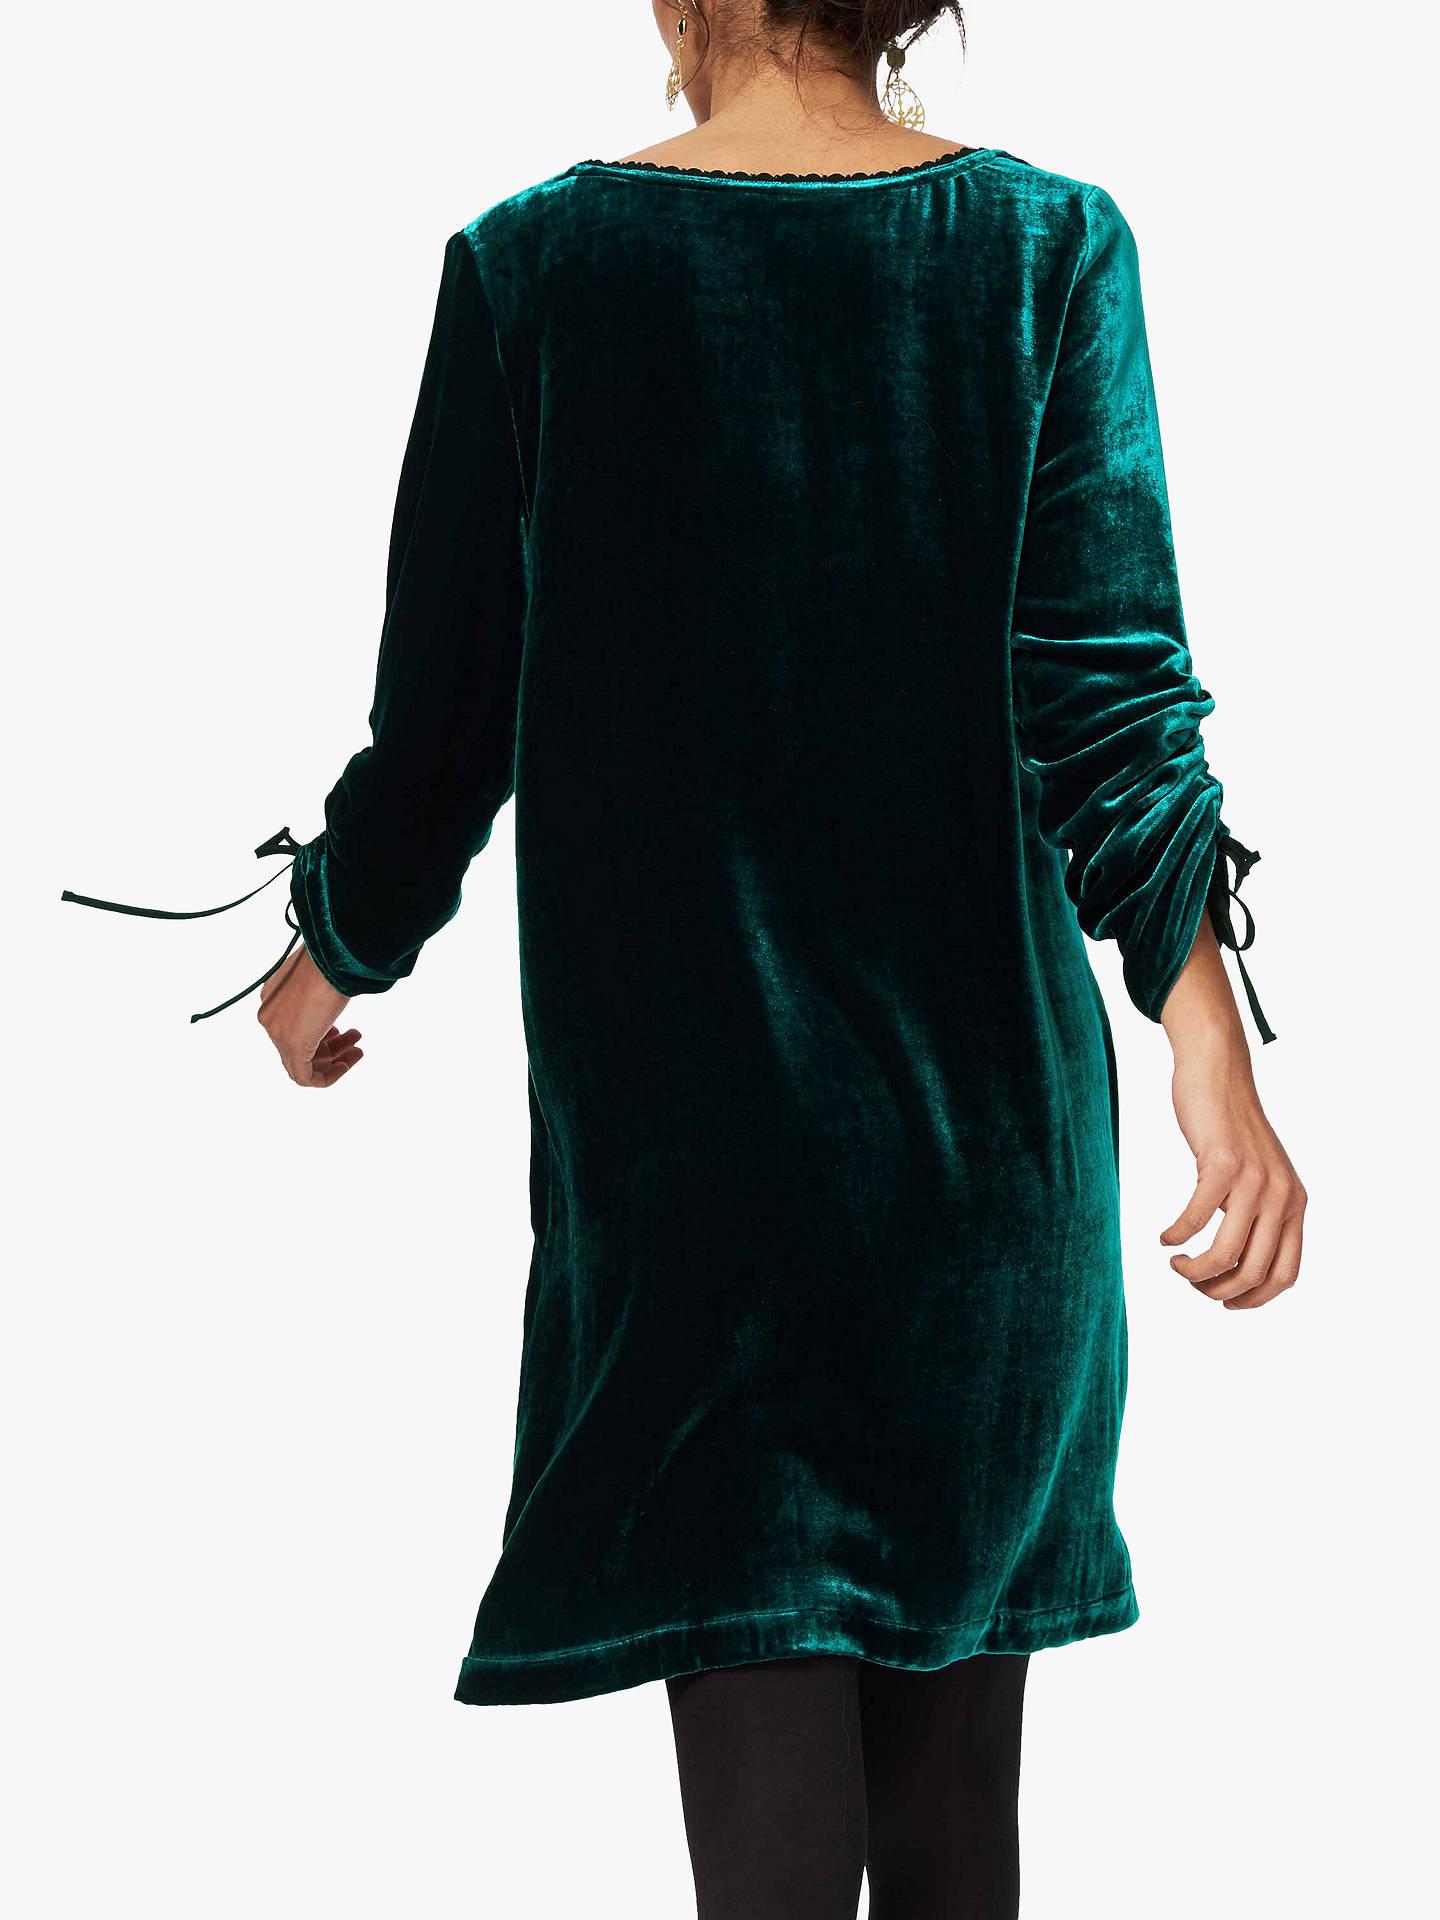 Brora Velvet Tunic Dress, Teal at John Lewis & Partners